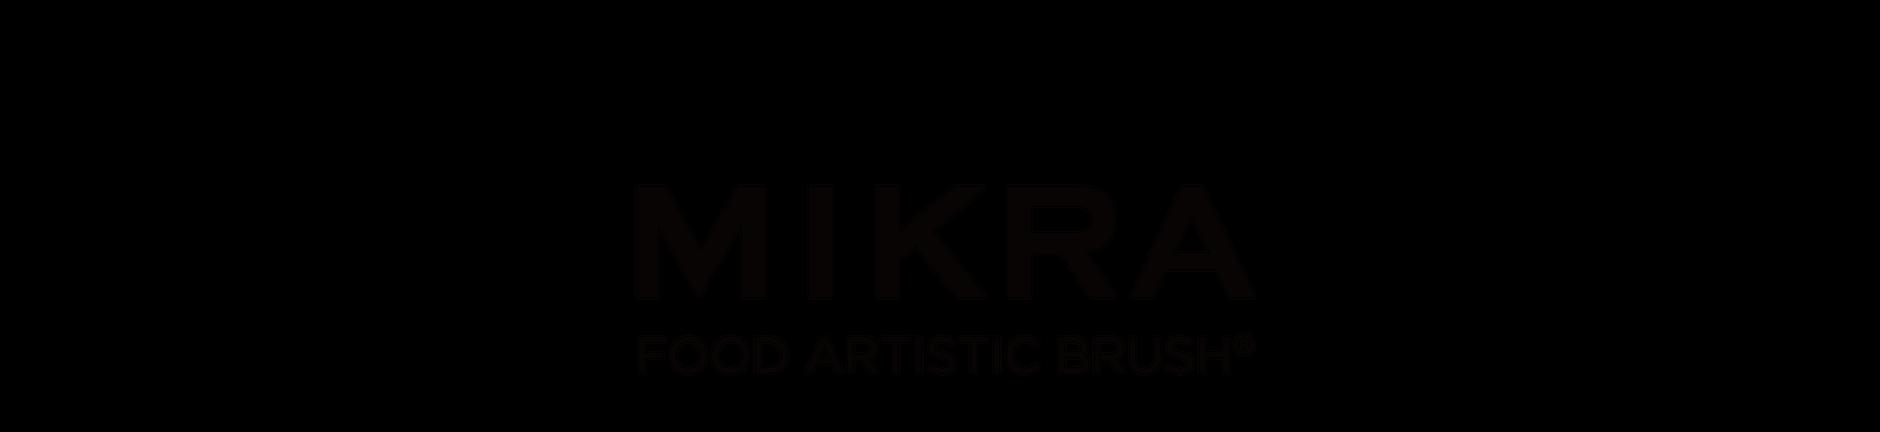 MIKRA - Food Artistic Brush®︎